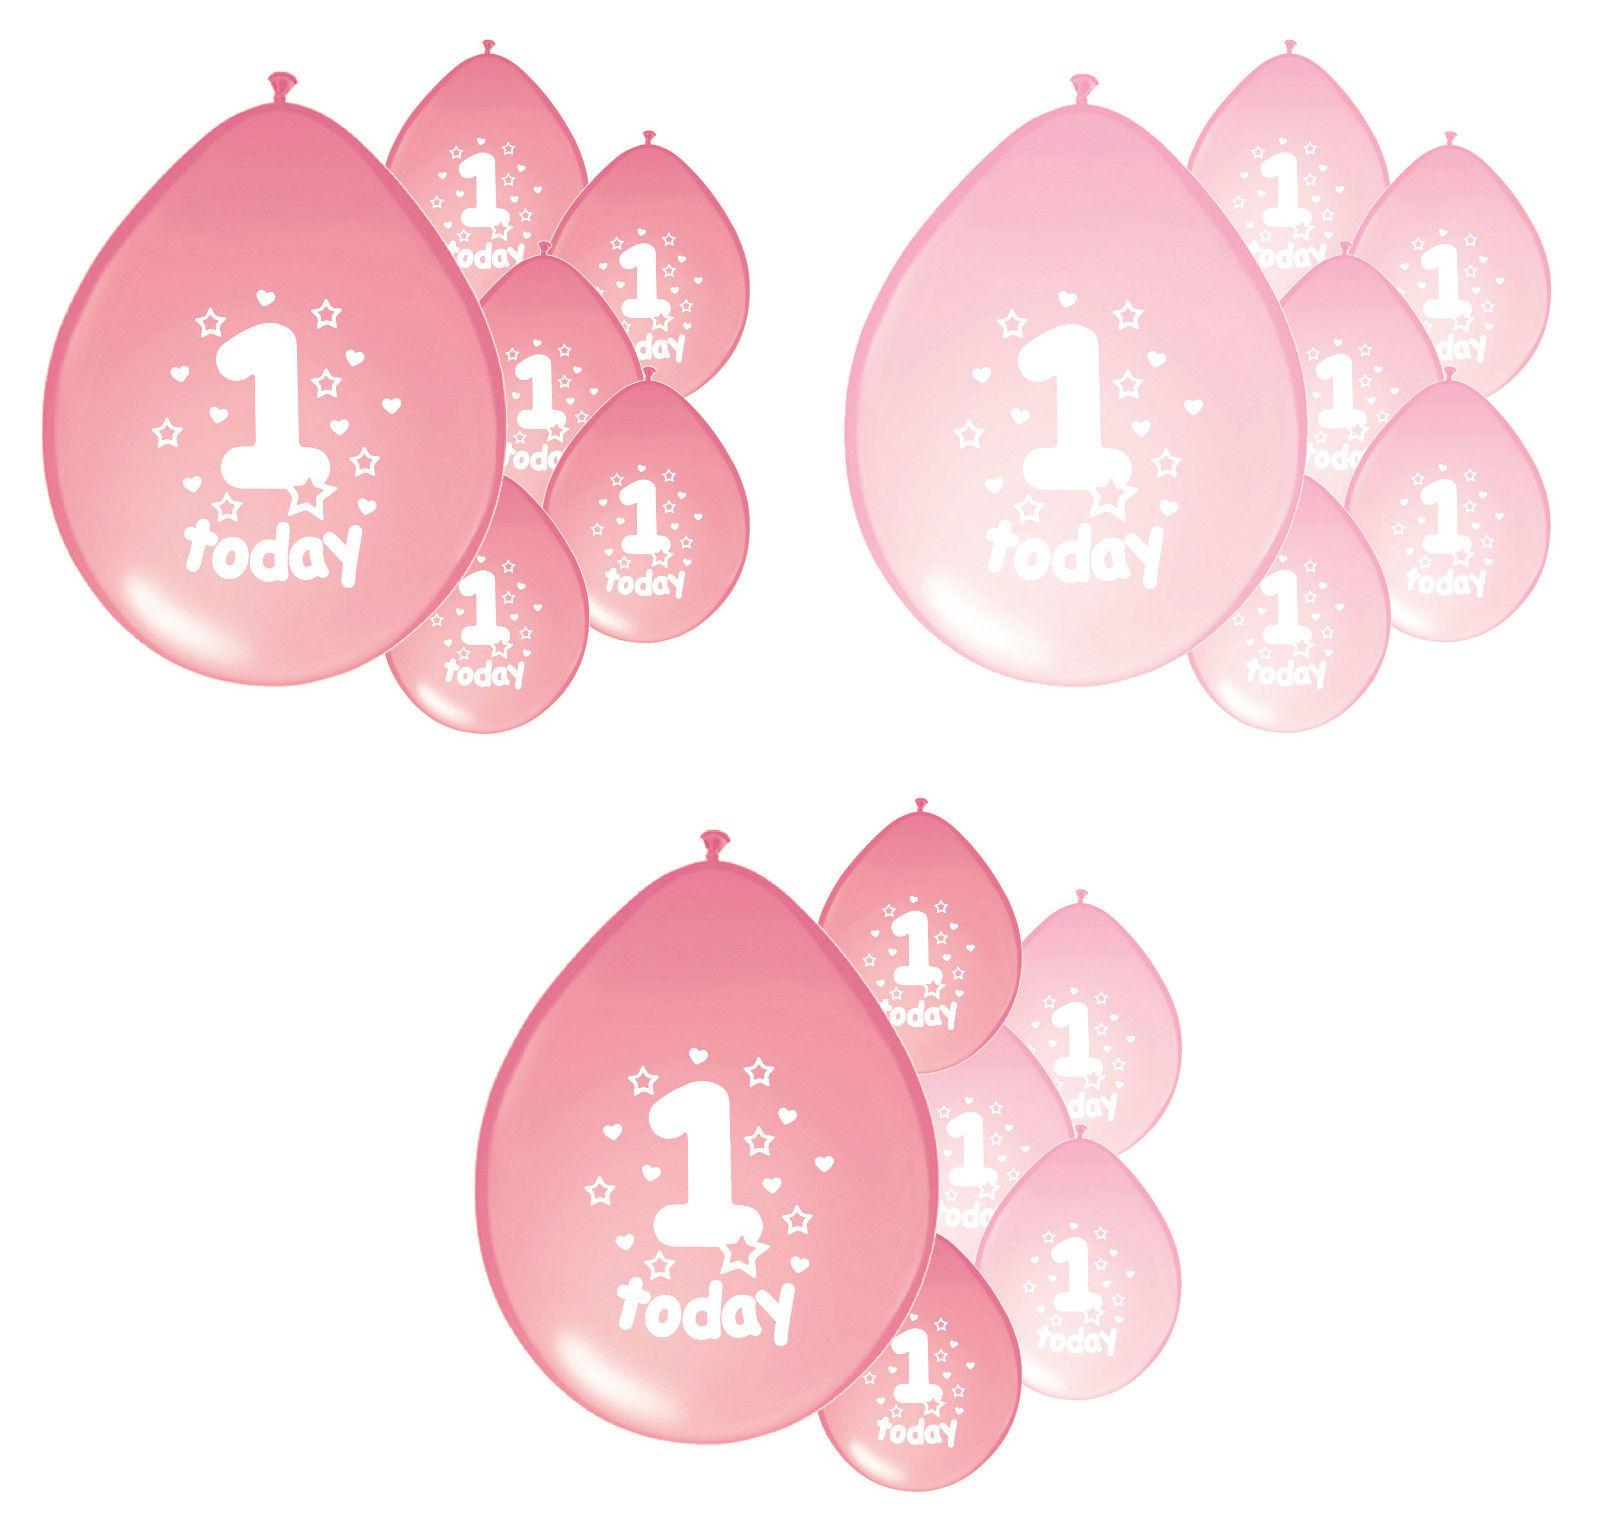 1ST BIRTHDAY BALLOONS X 10